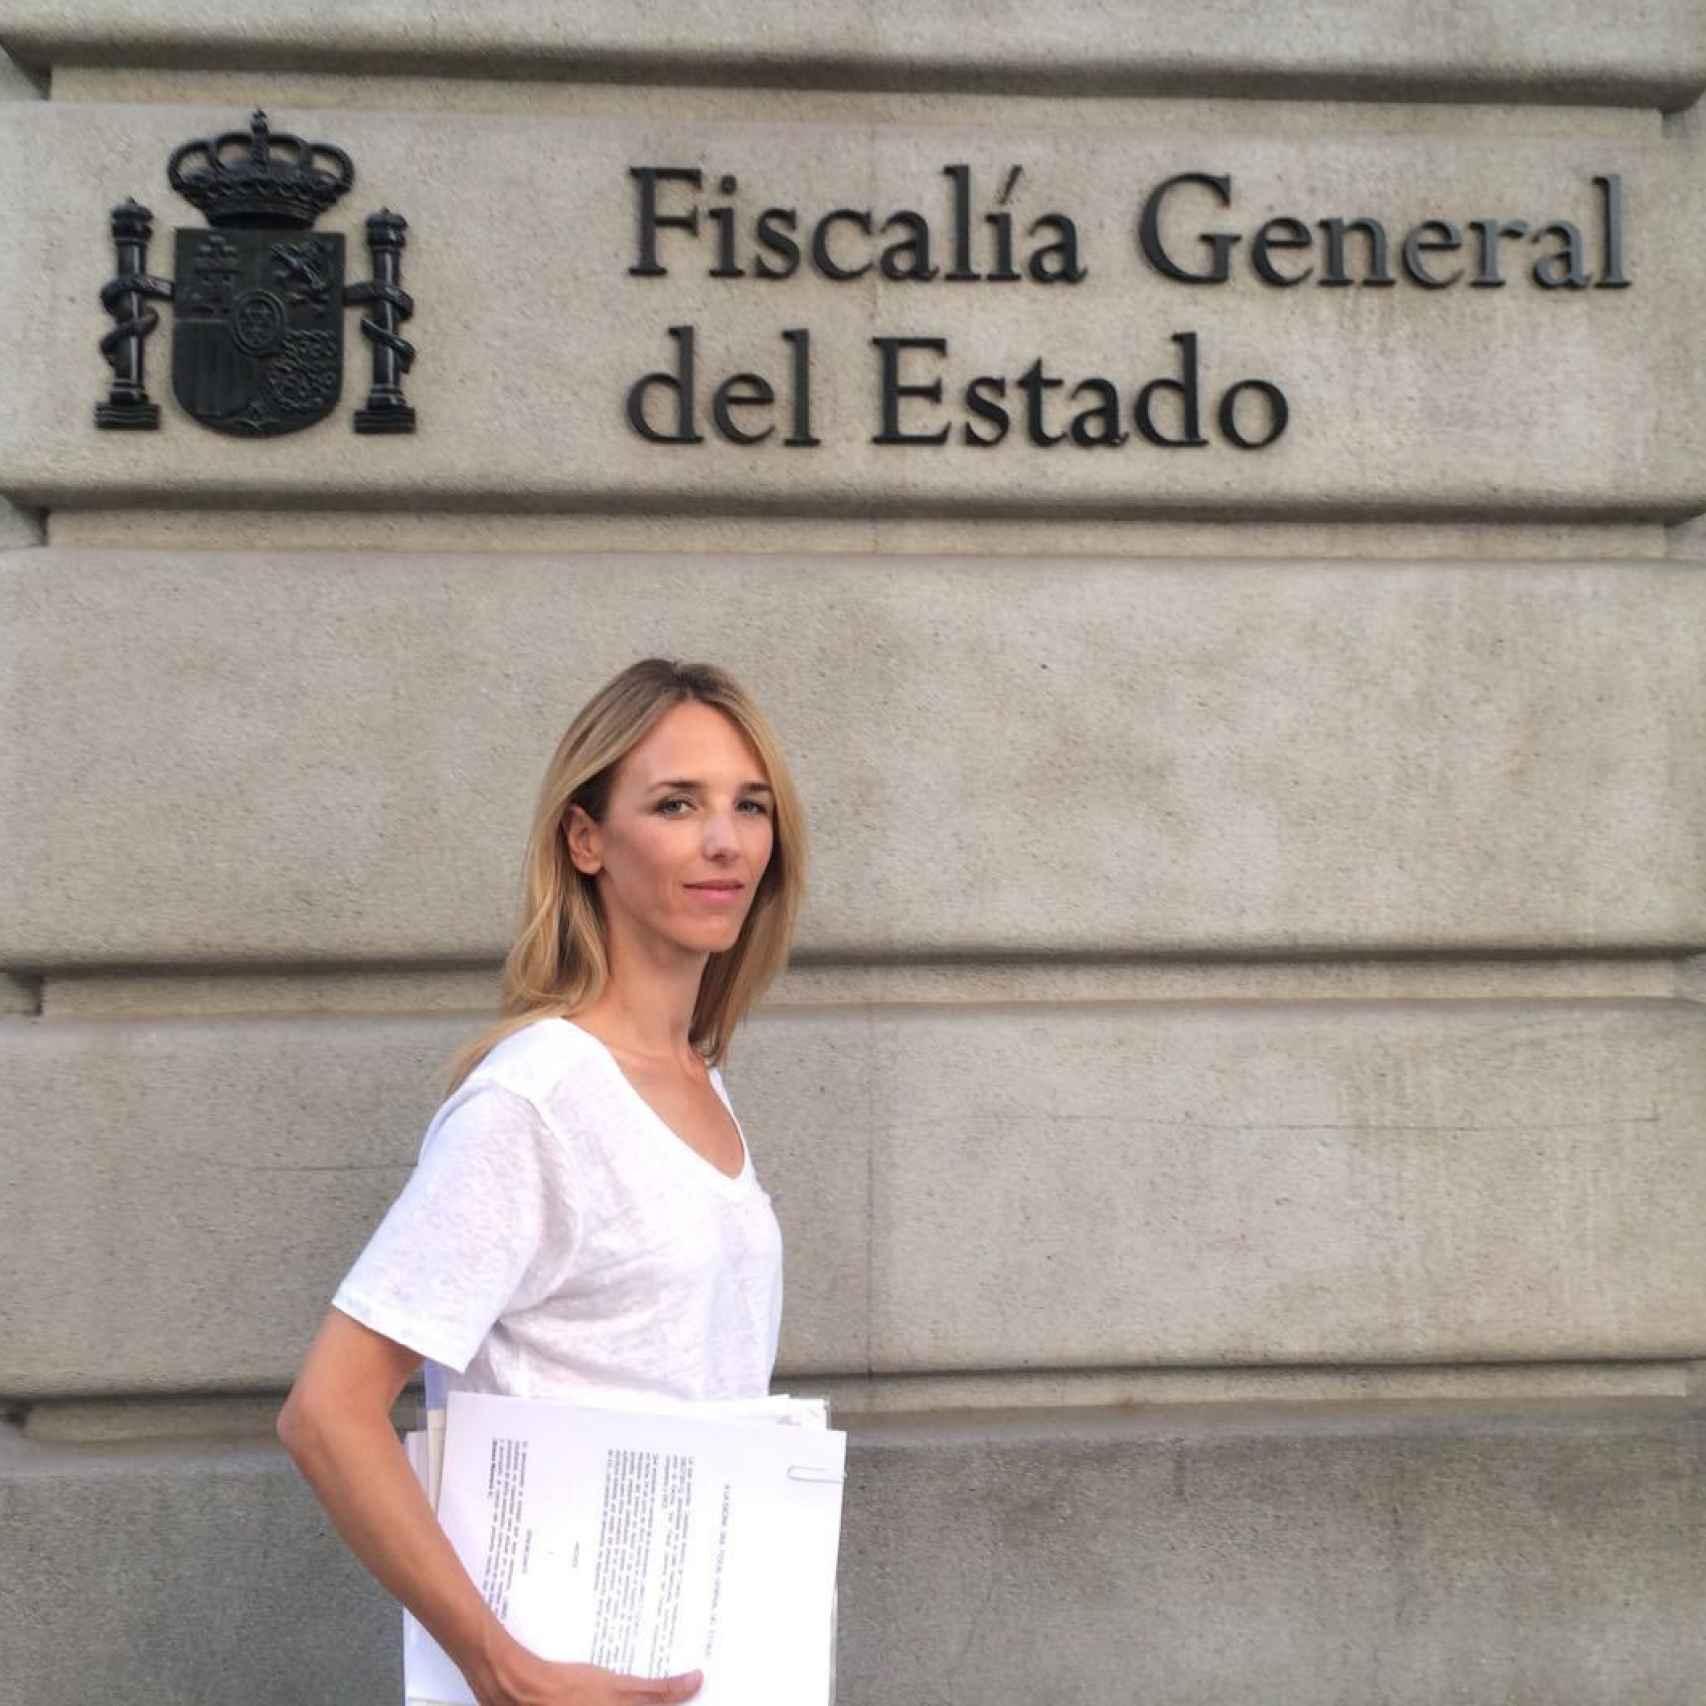 Cayetana Álvarez de Toledo, portavoz de la plataforma, presenta la denuncia ante la Fiscalía.